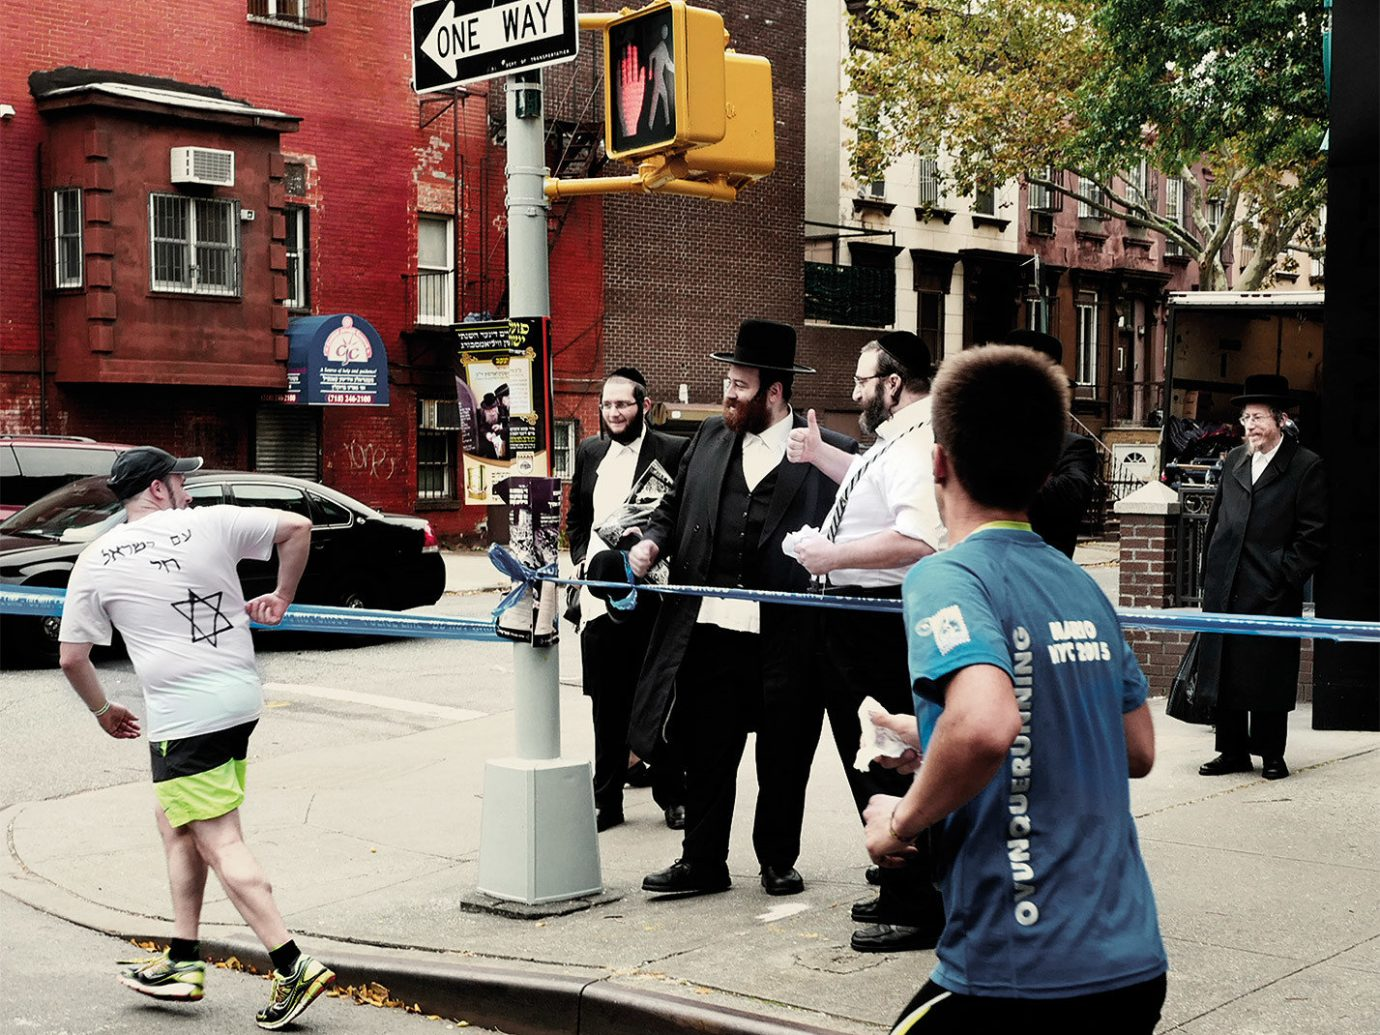 Arts + Culture outdoor person road street sports infrastructure endurance pedestrian running race